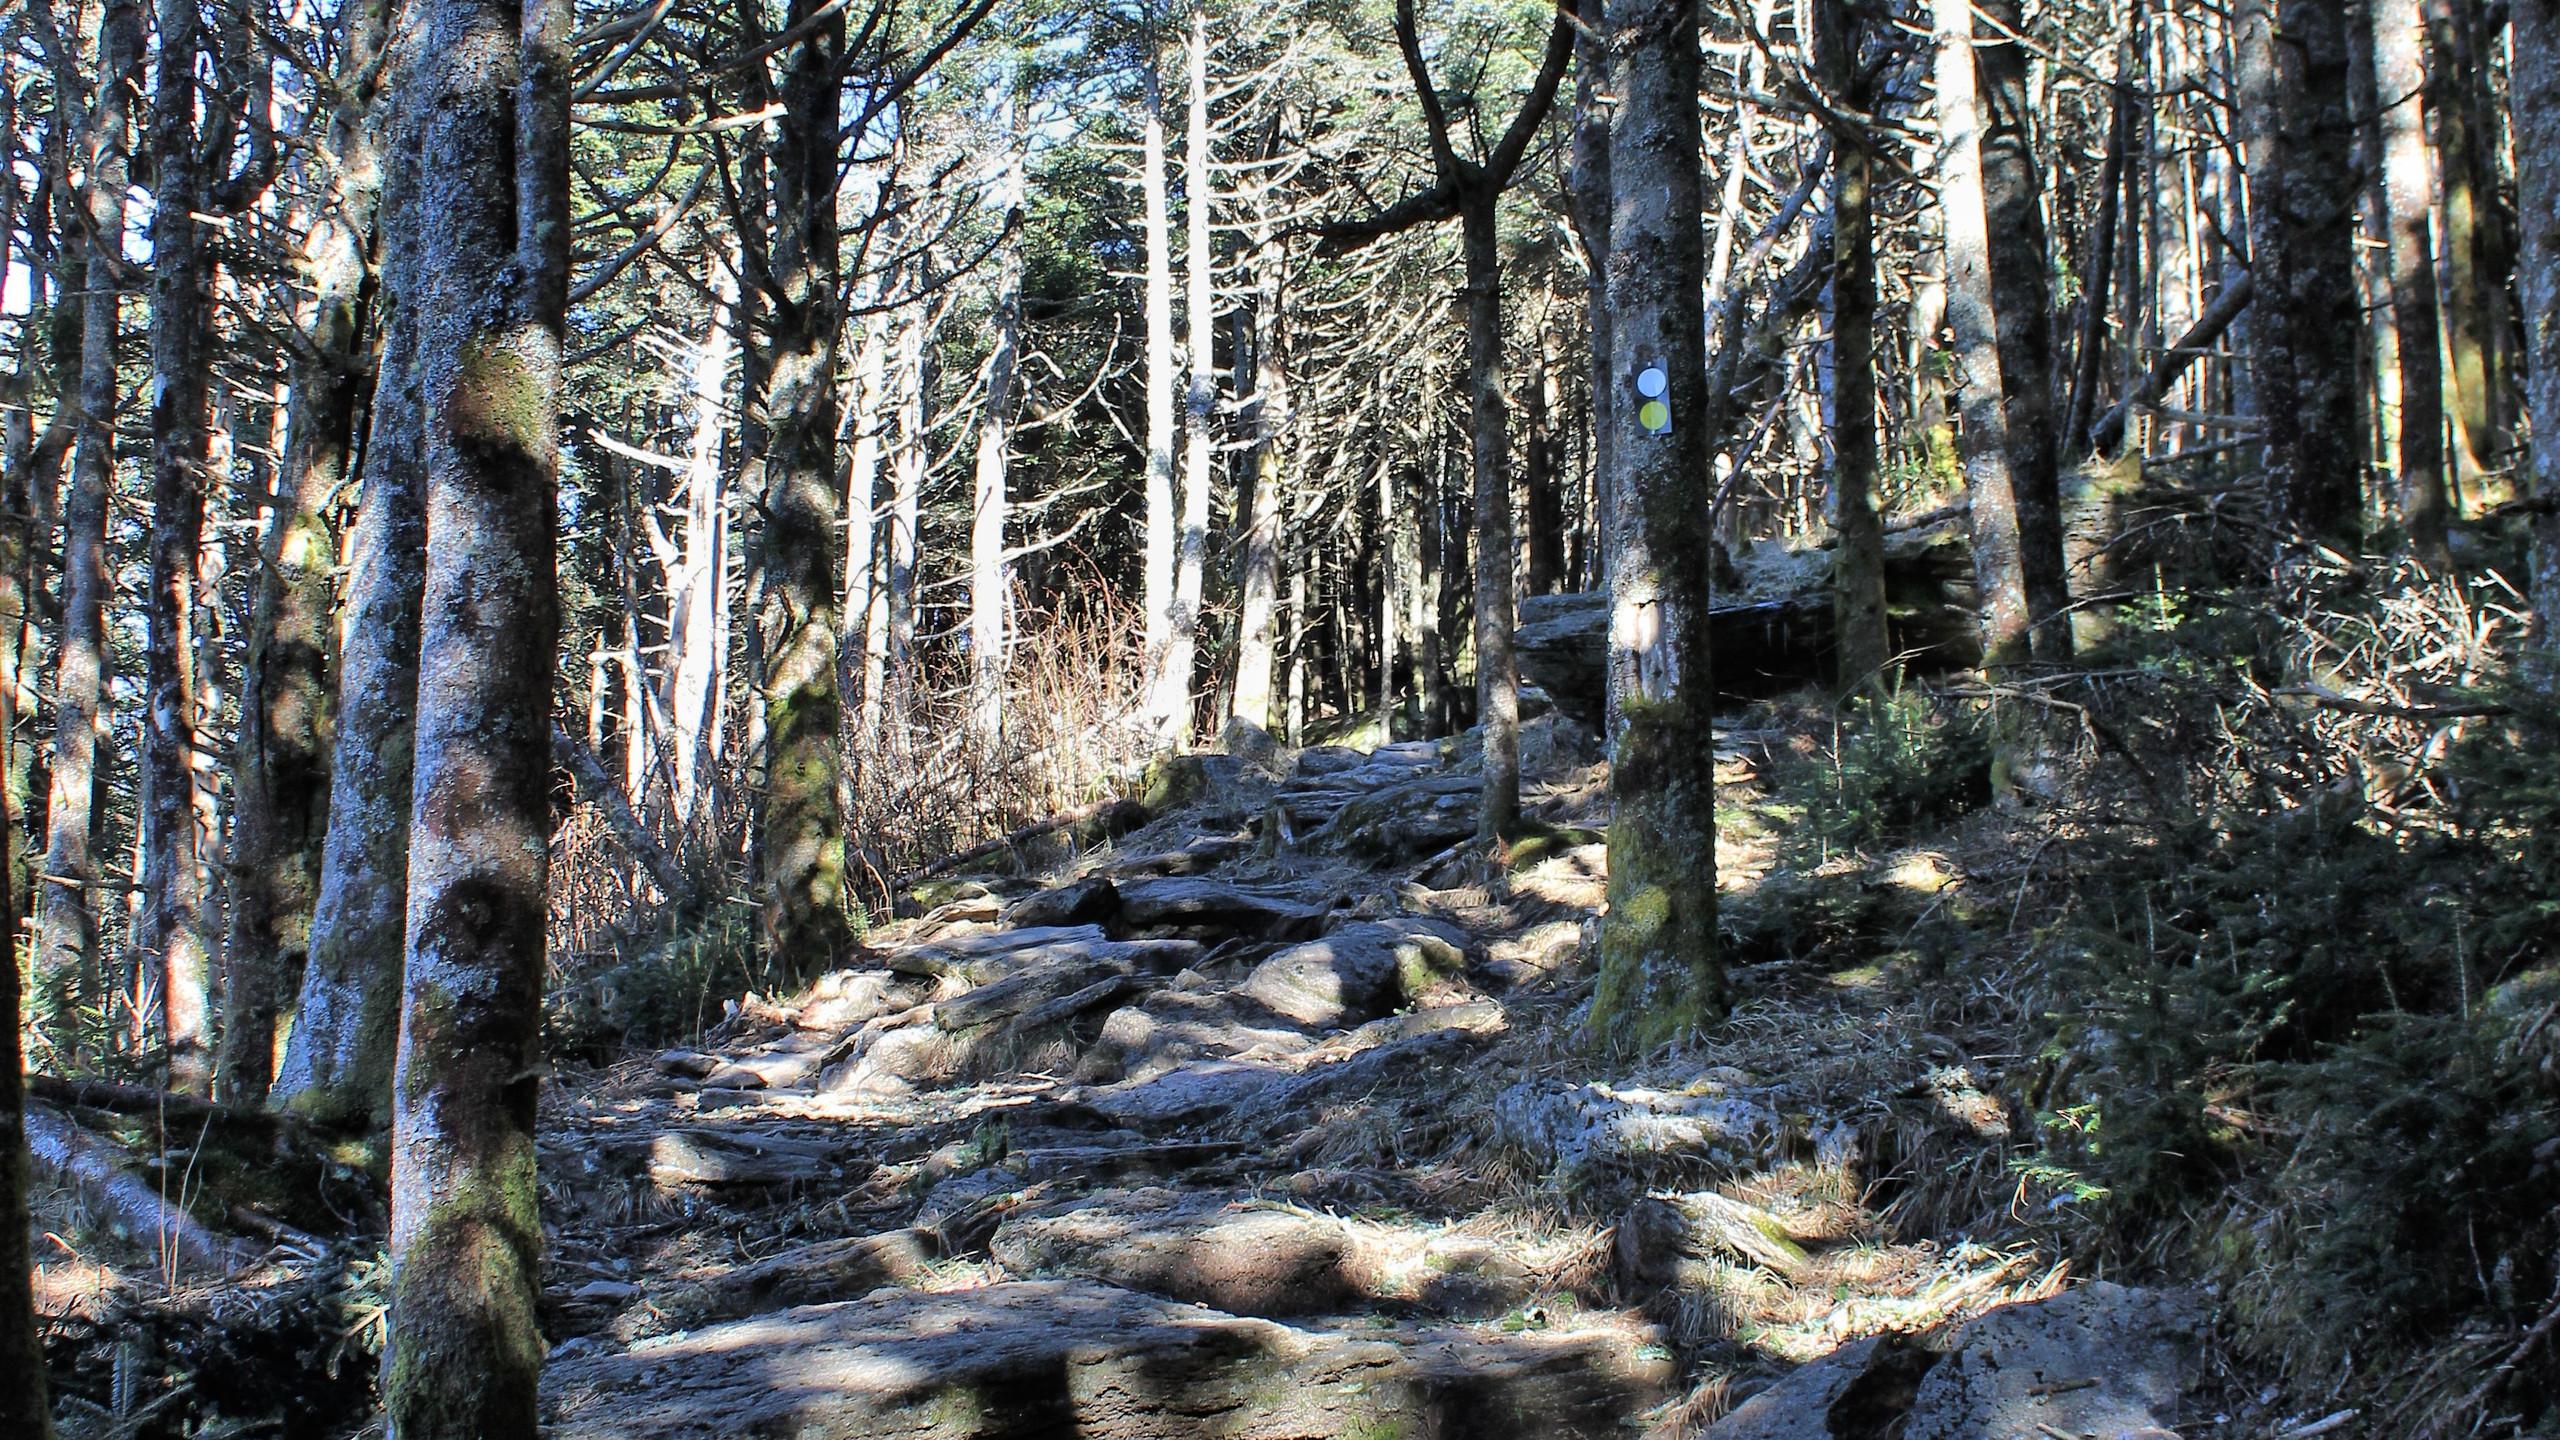 Steep Stretch of Trail